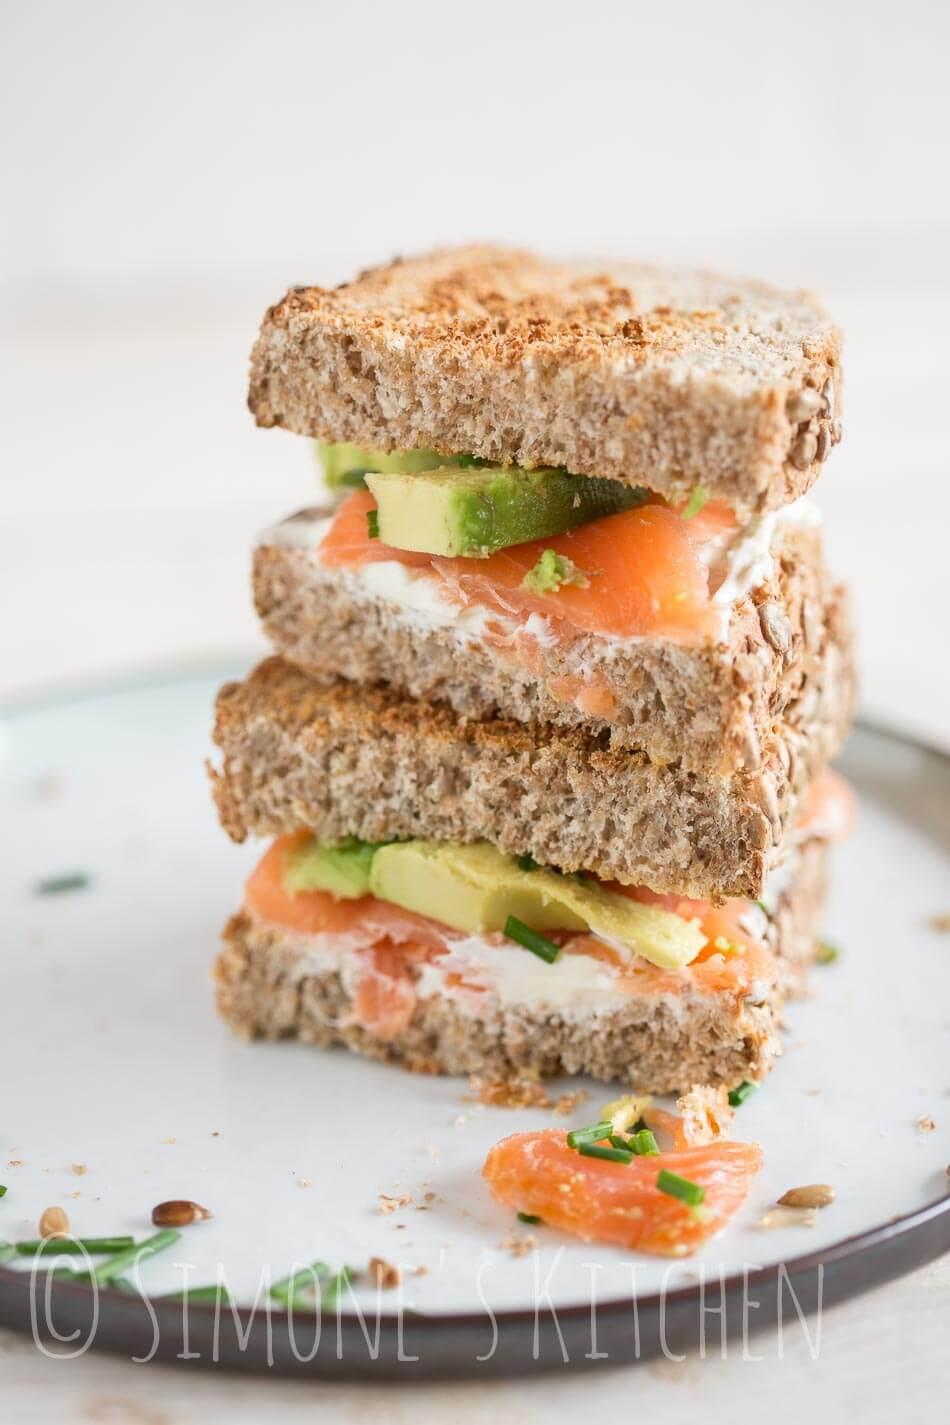 Zalm sandwich met avocado   simoneskitchen.nl